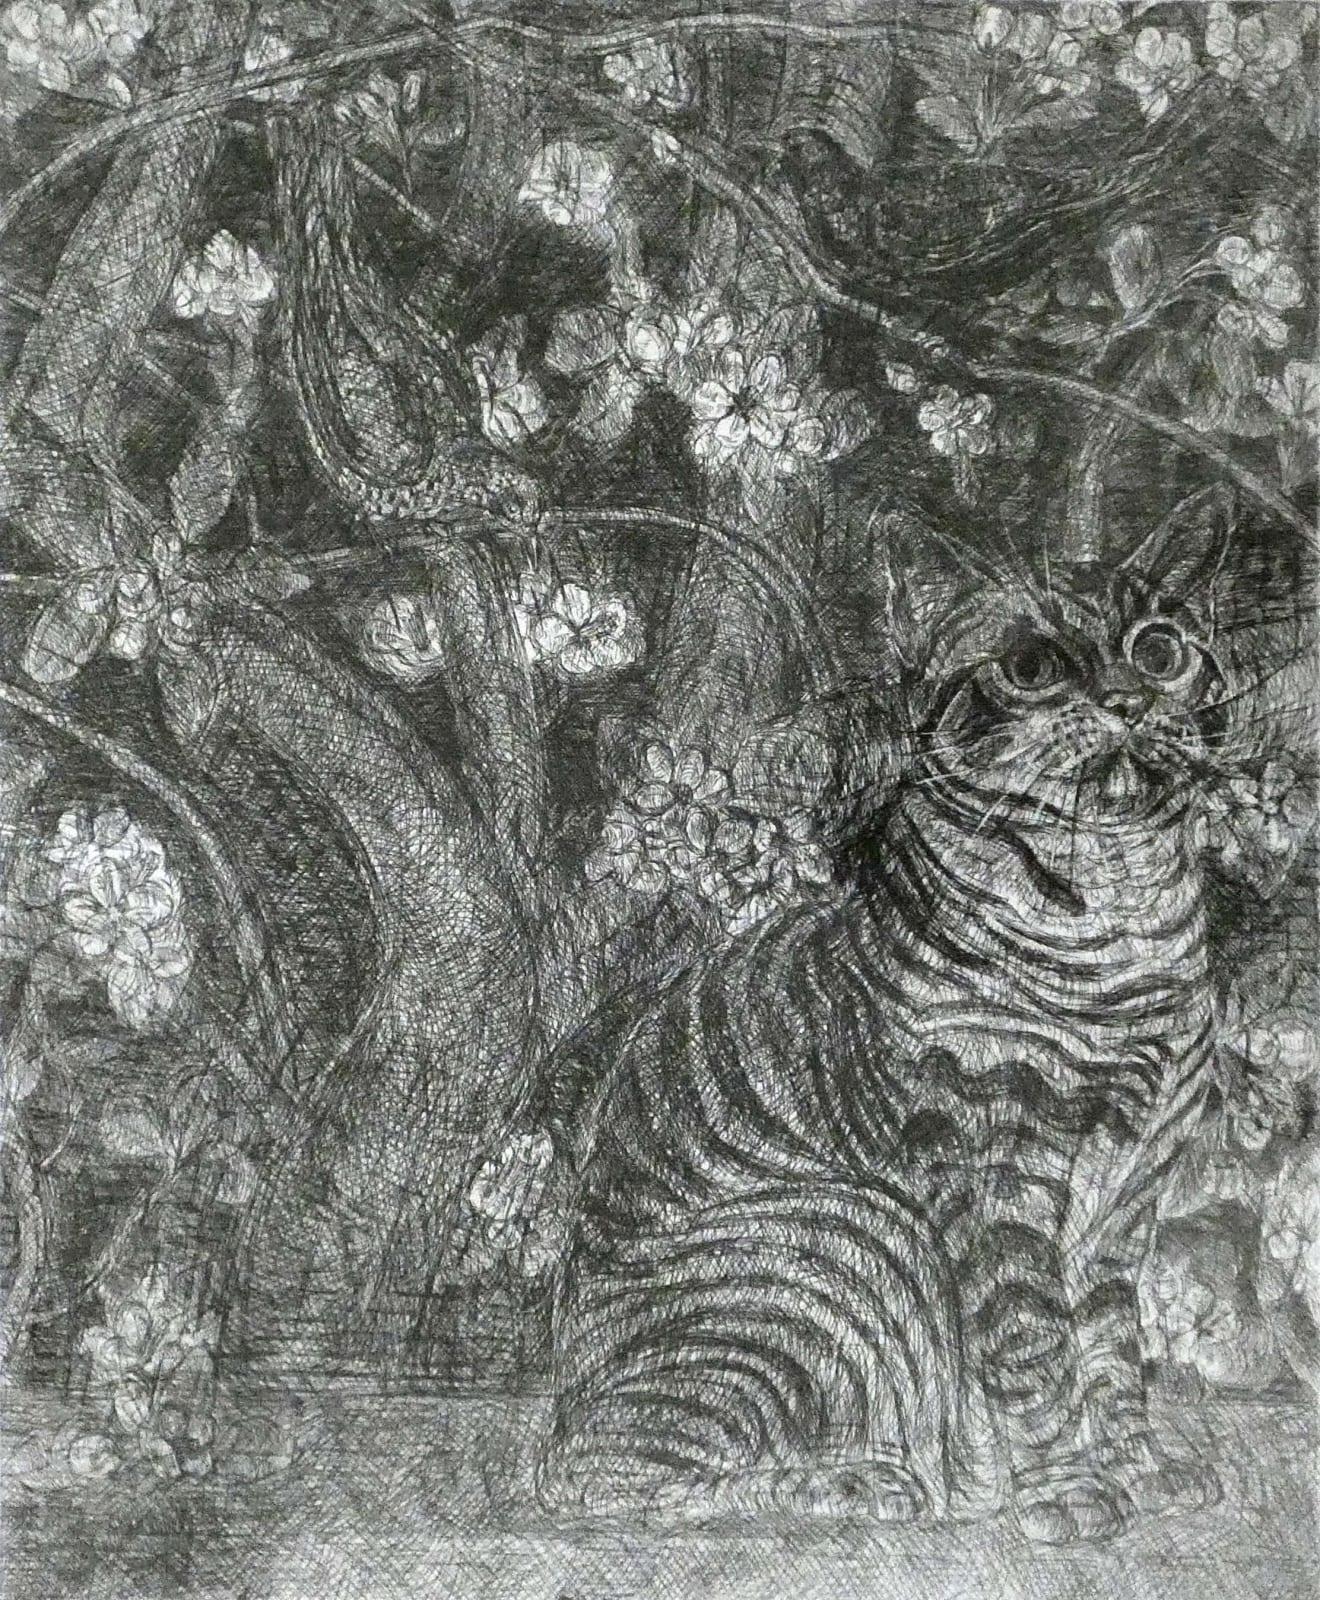 Leonard Mccomb, Cat, Blossoming, Apple Tree, Black Bird and Thrush, 2005